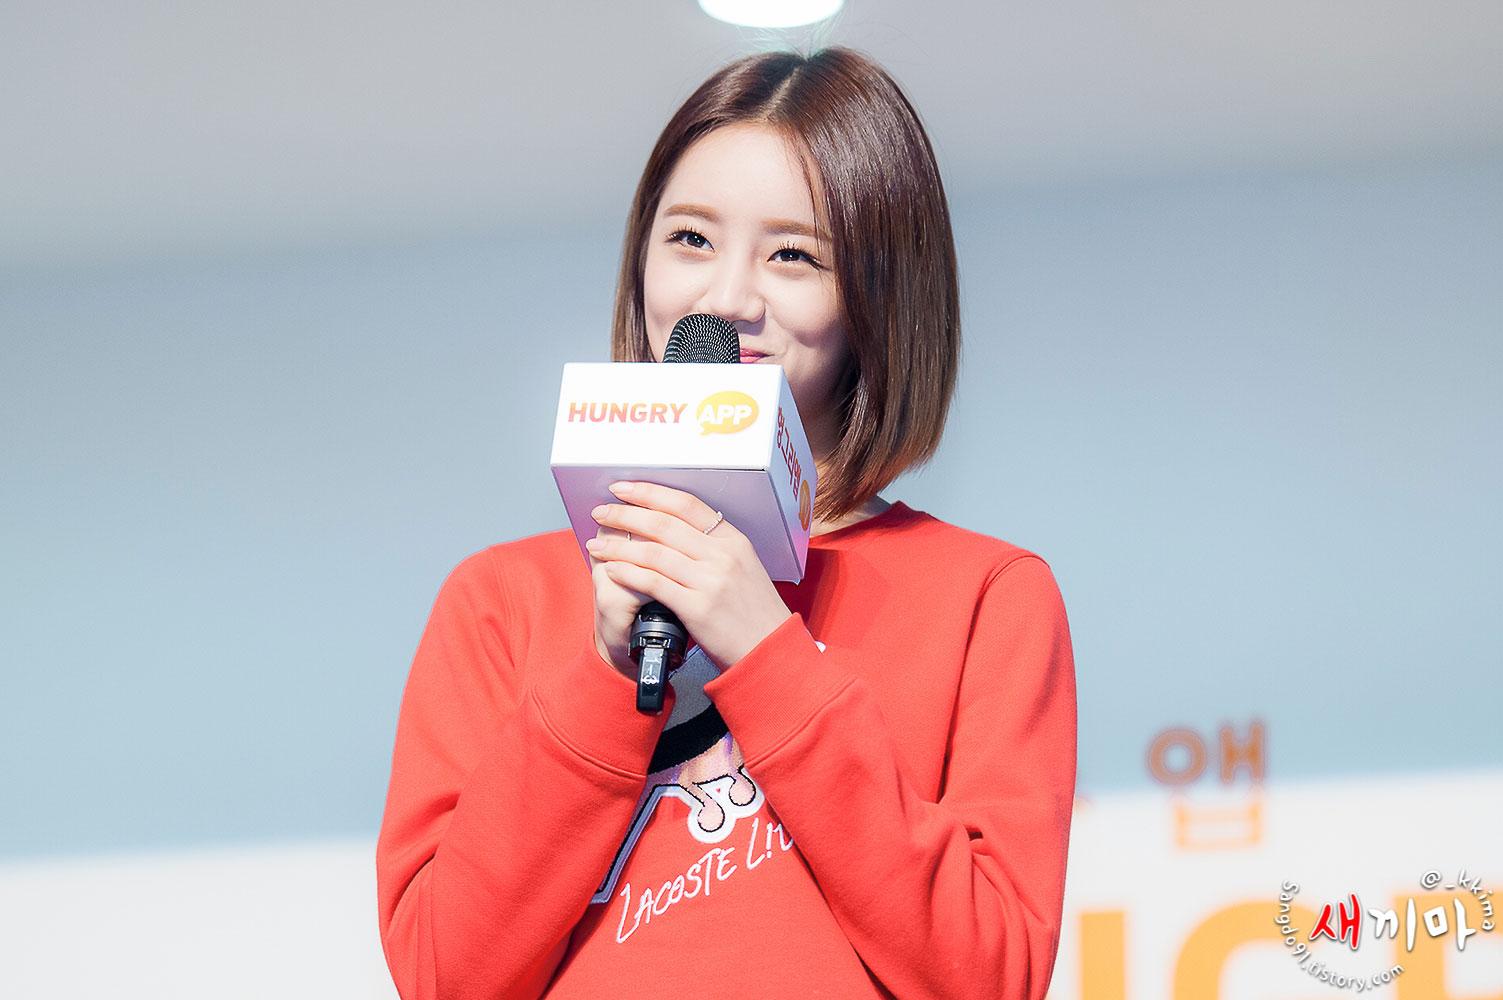 Girls Day Hyeri G-STAR 2014 Hungry App